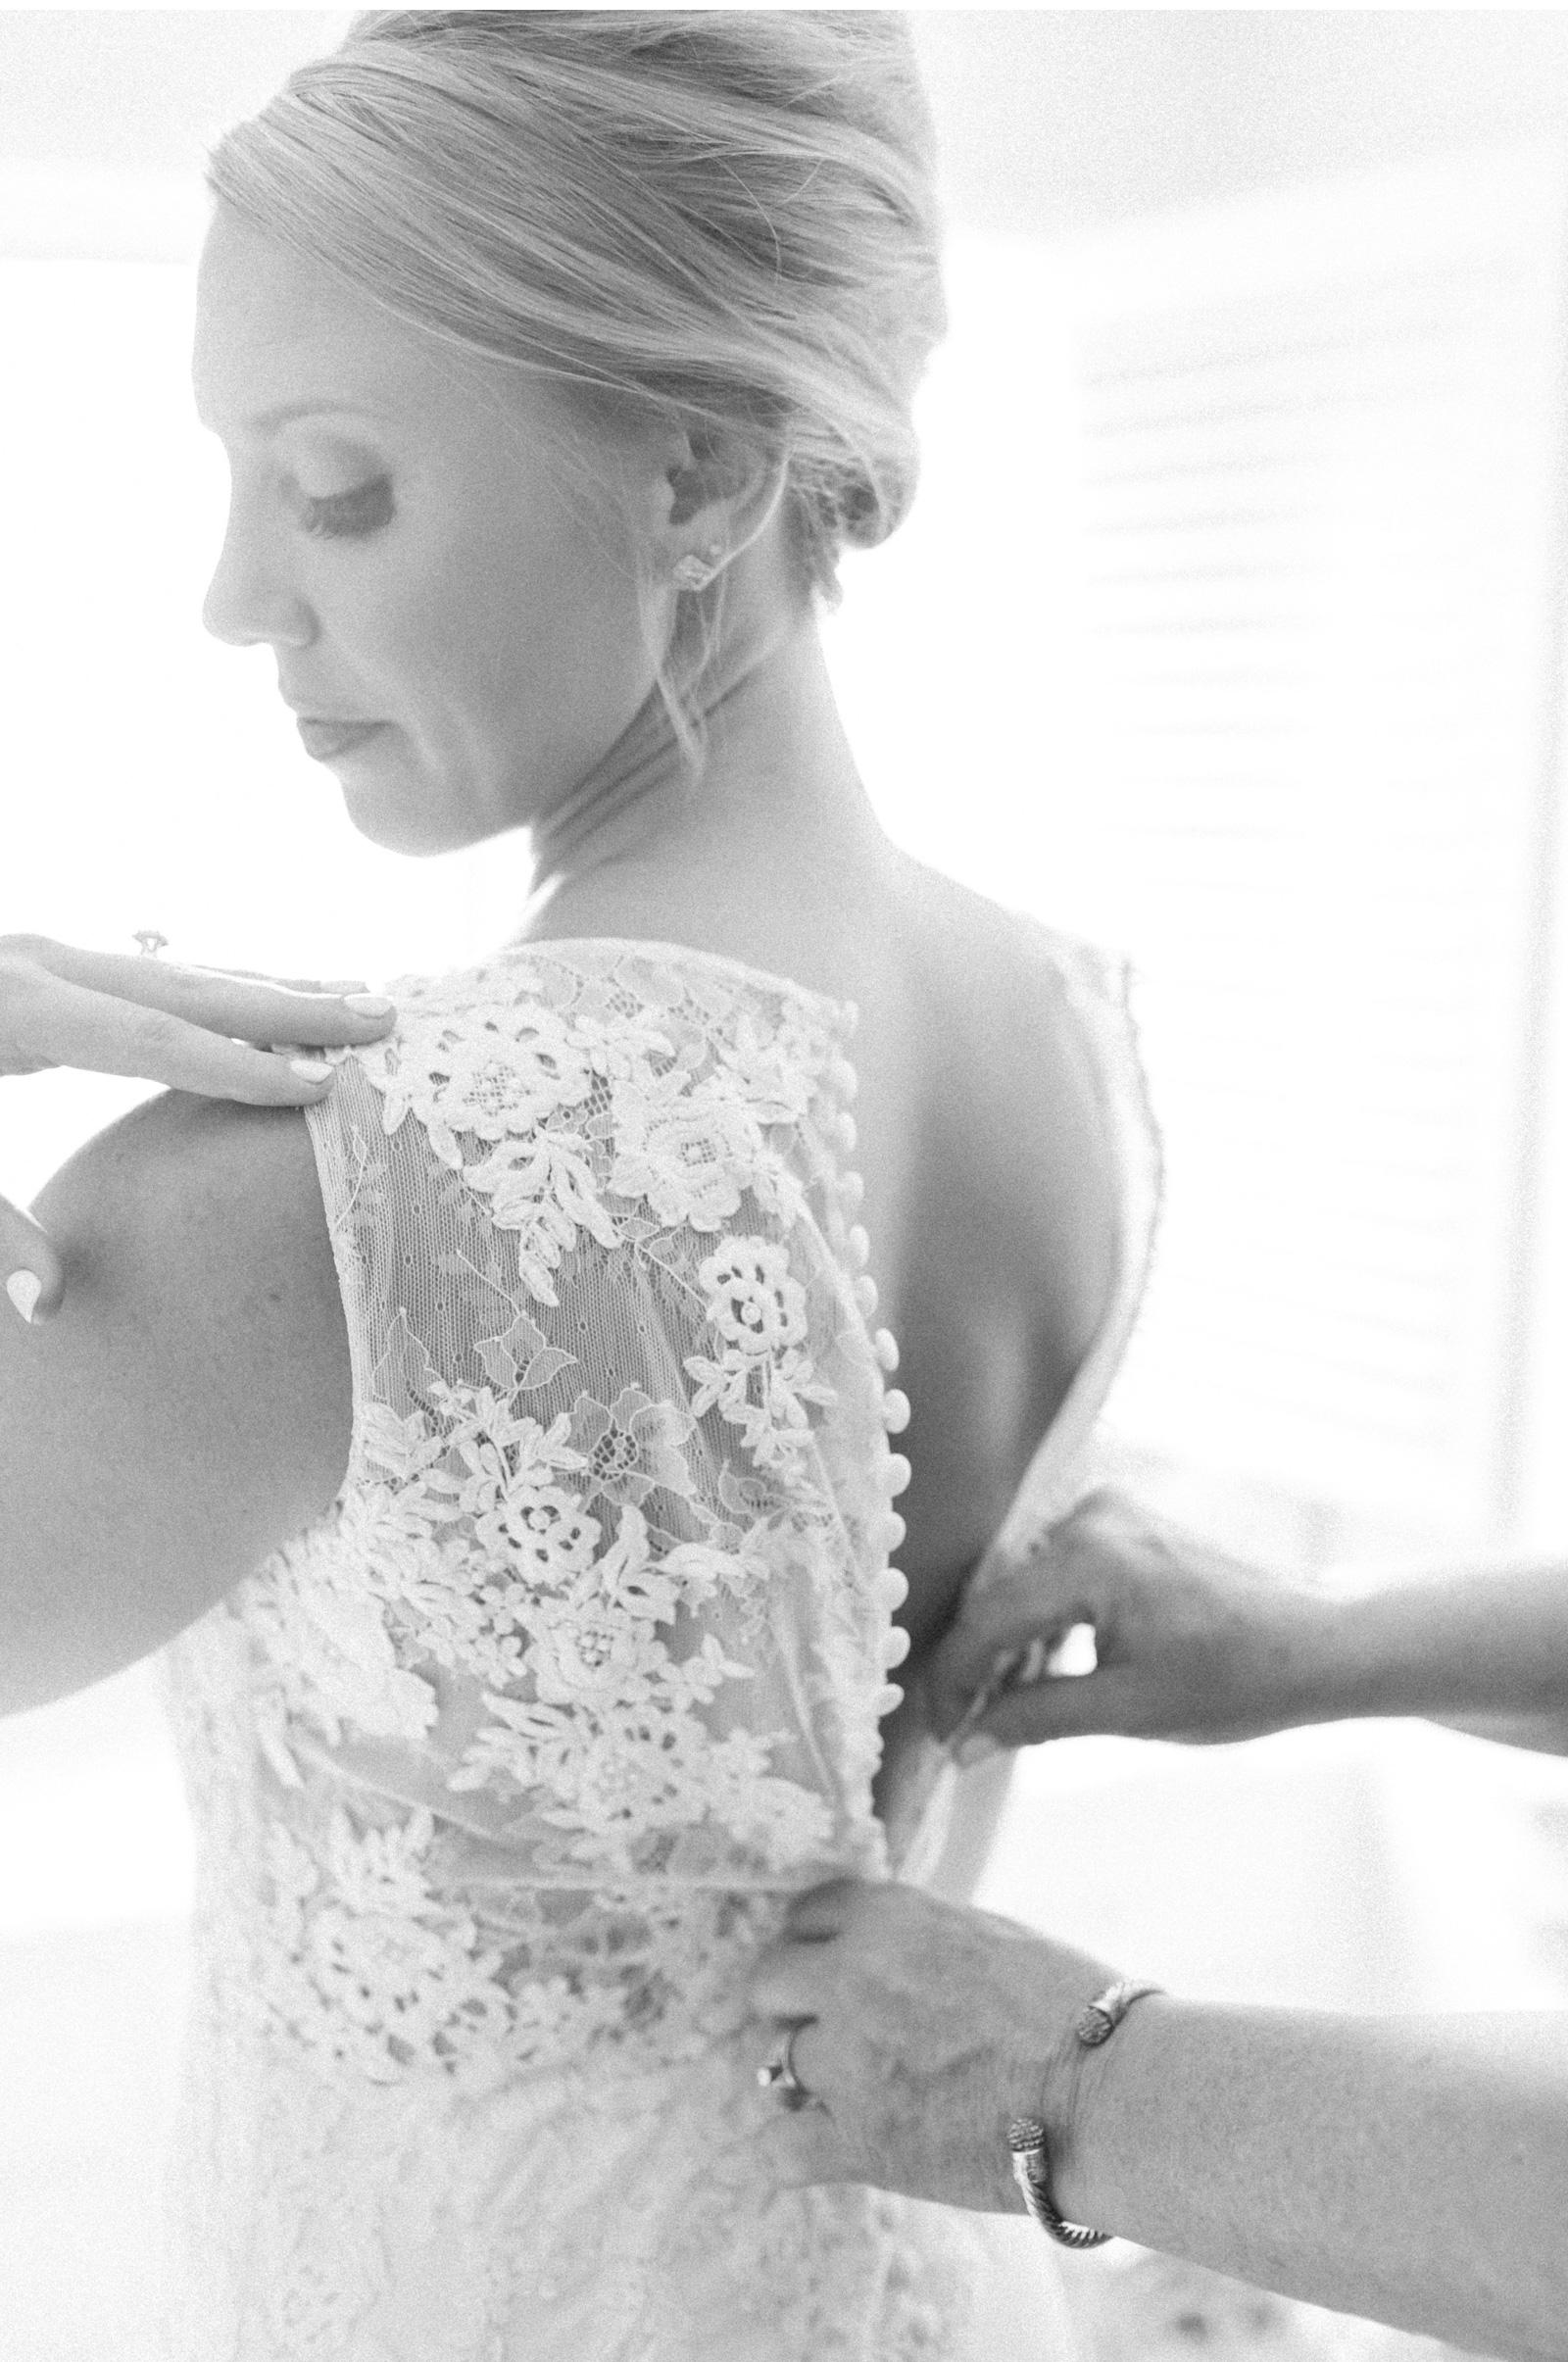 Southern-California-Wedding-Photographer-Natalie-Schutt-Photography_06.jpg